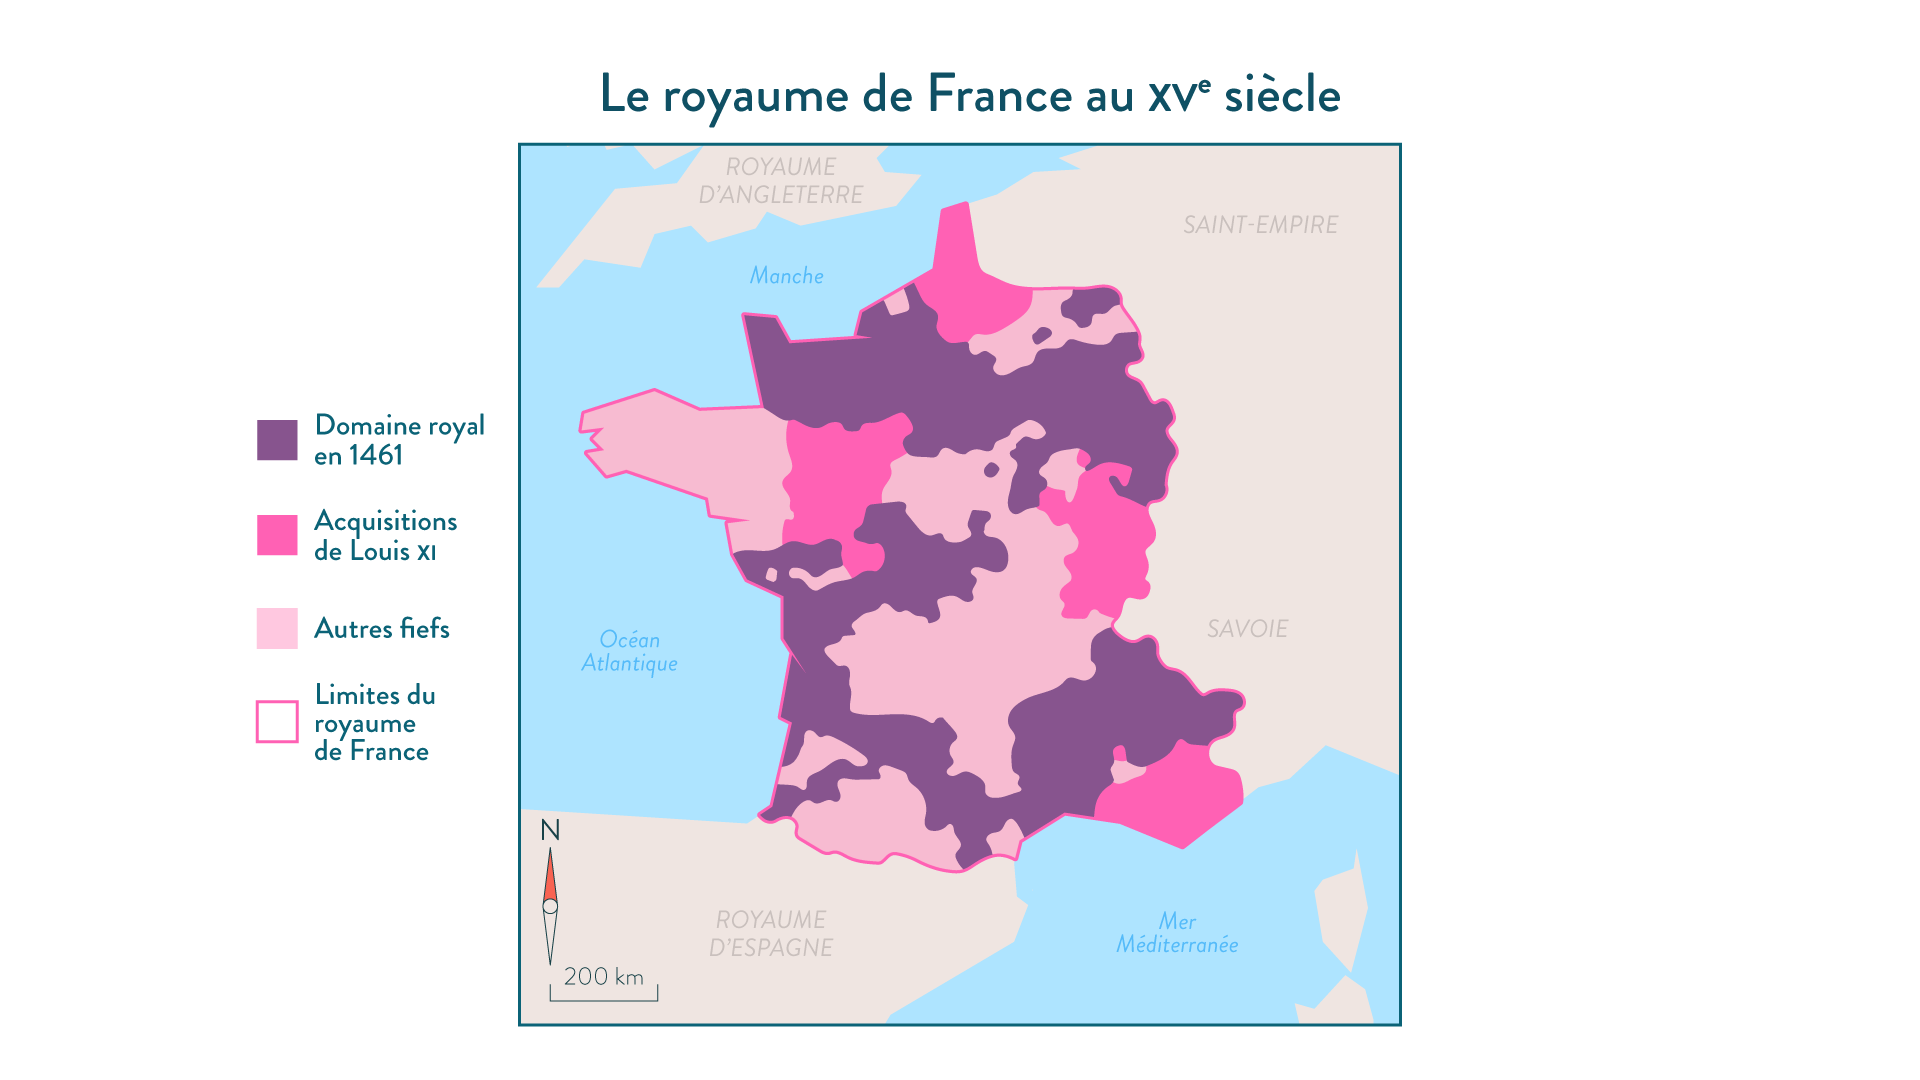 Le royaume de France au XV<sup>e</sup>siècle - 5e - histoire